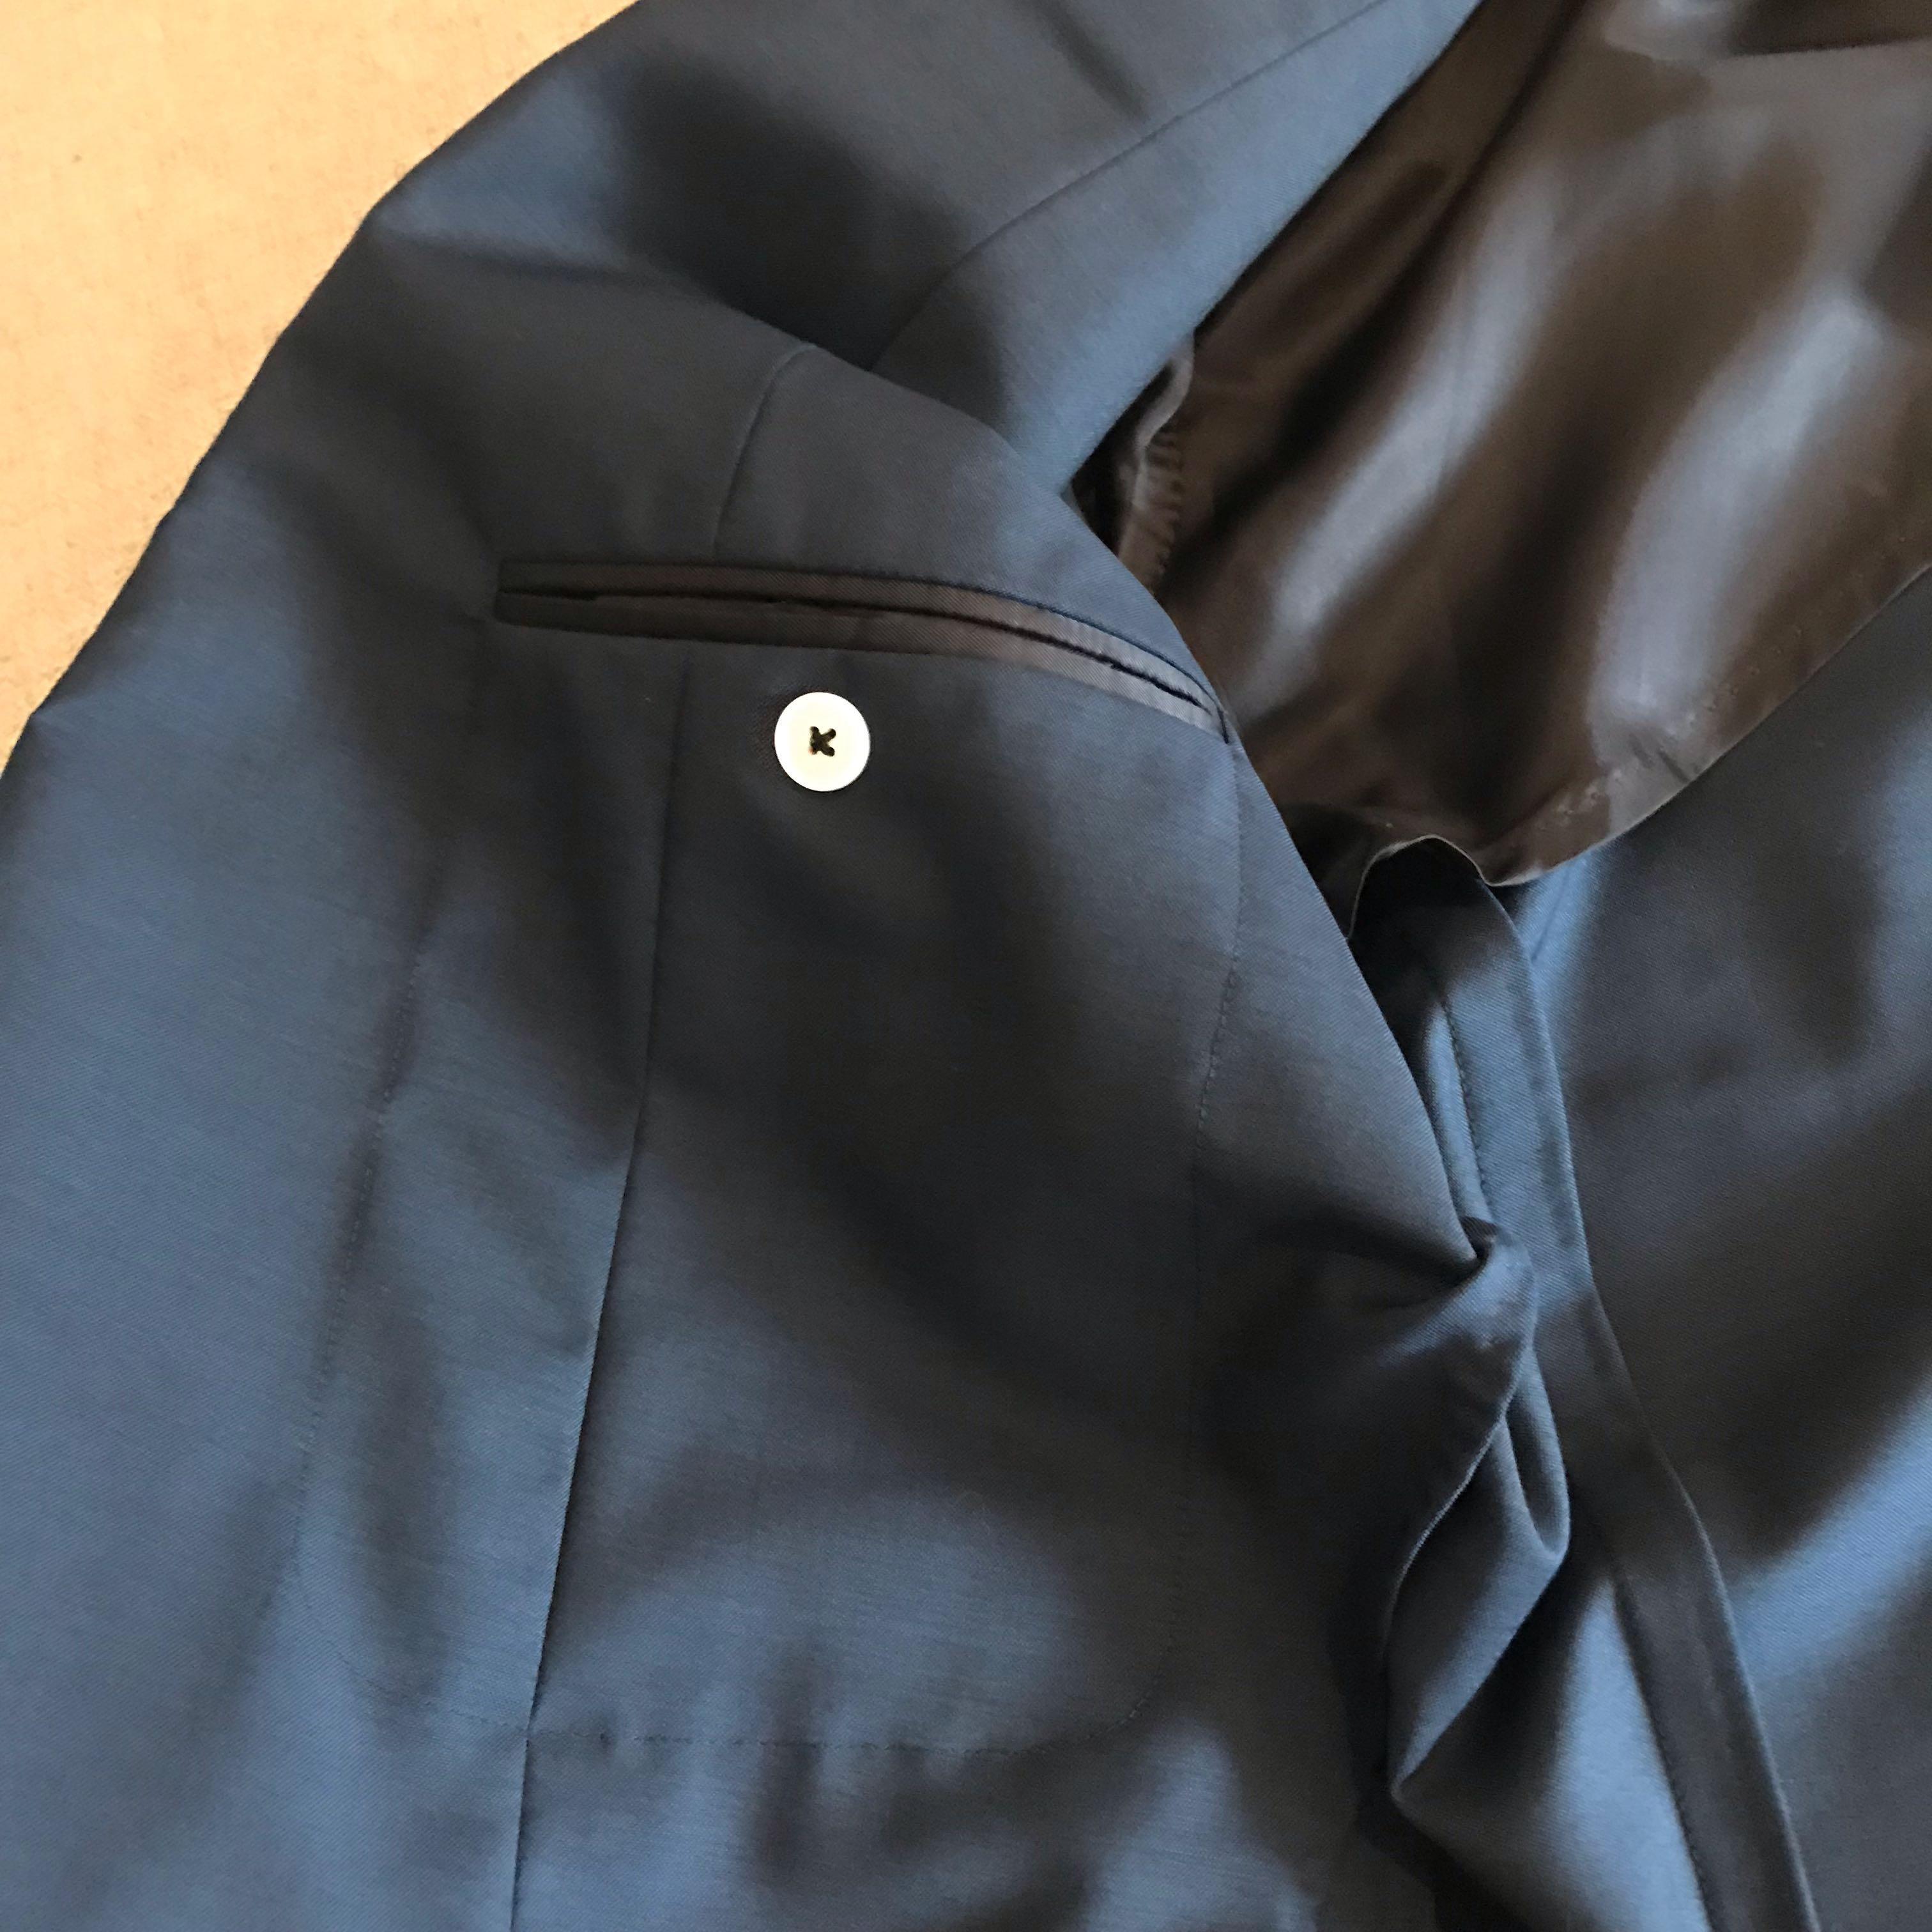 Men's tailored navy suit jacket - size 50